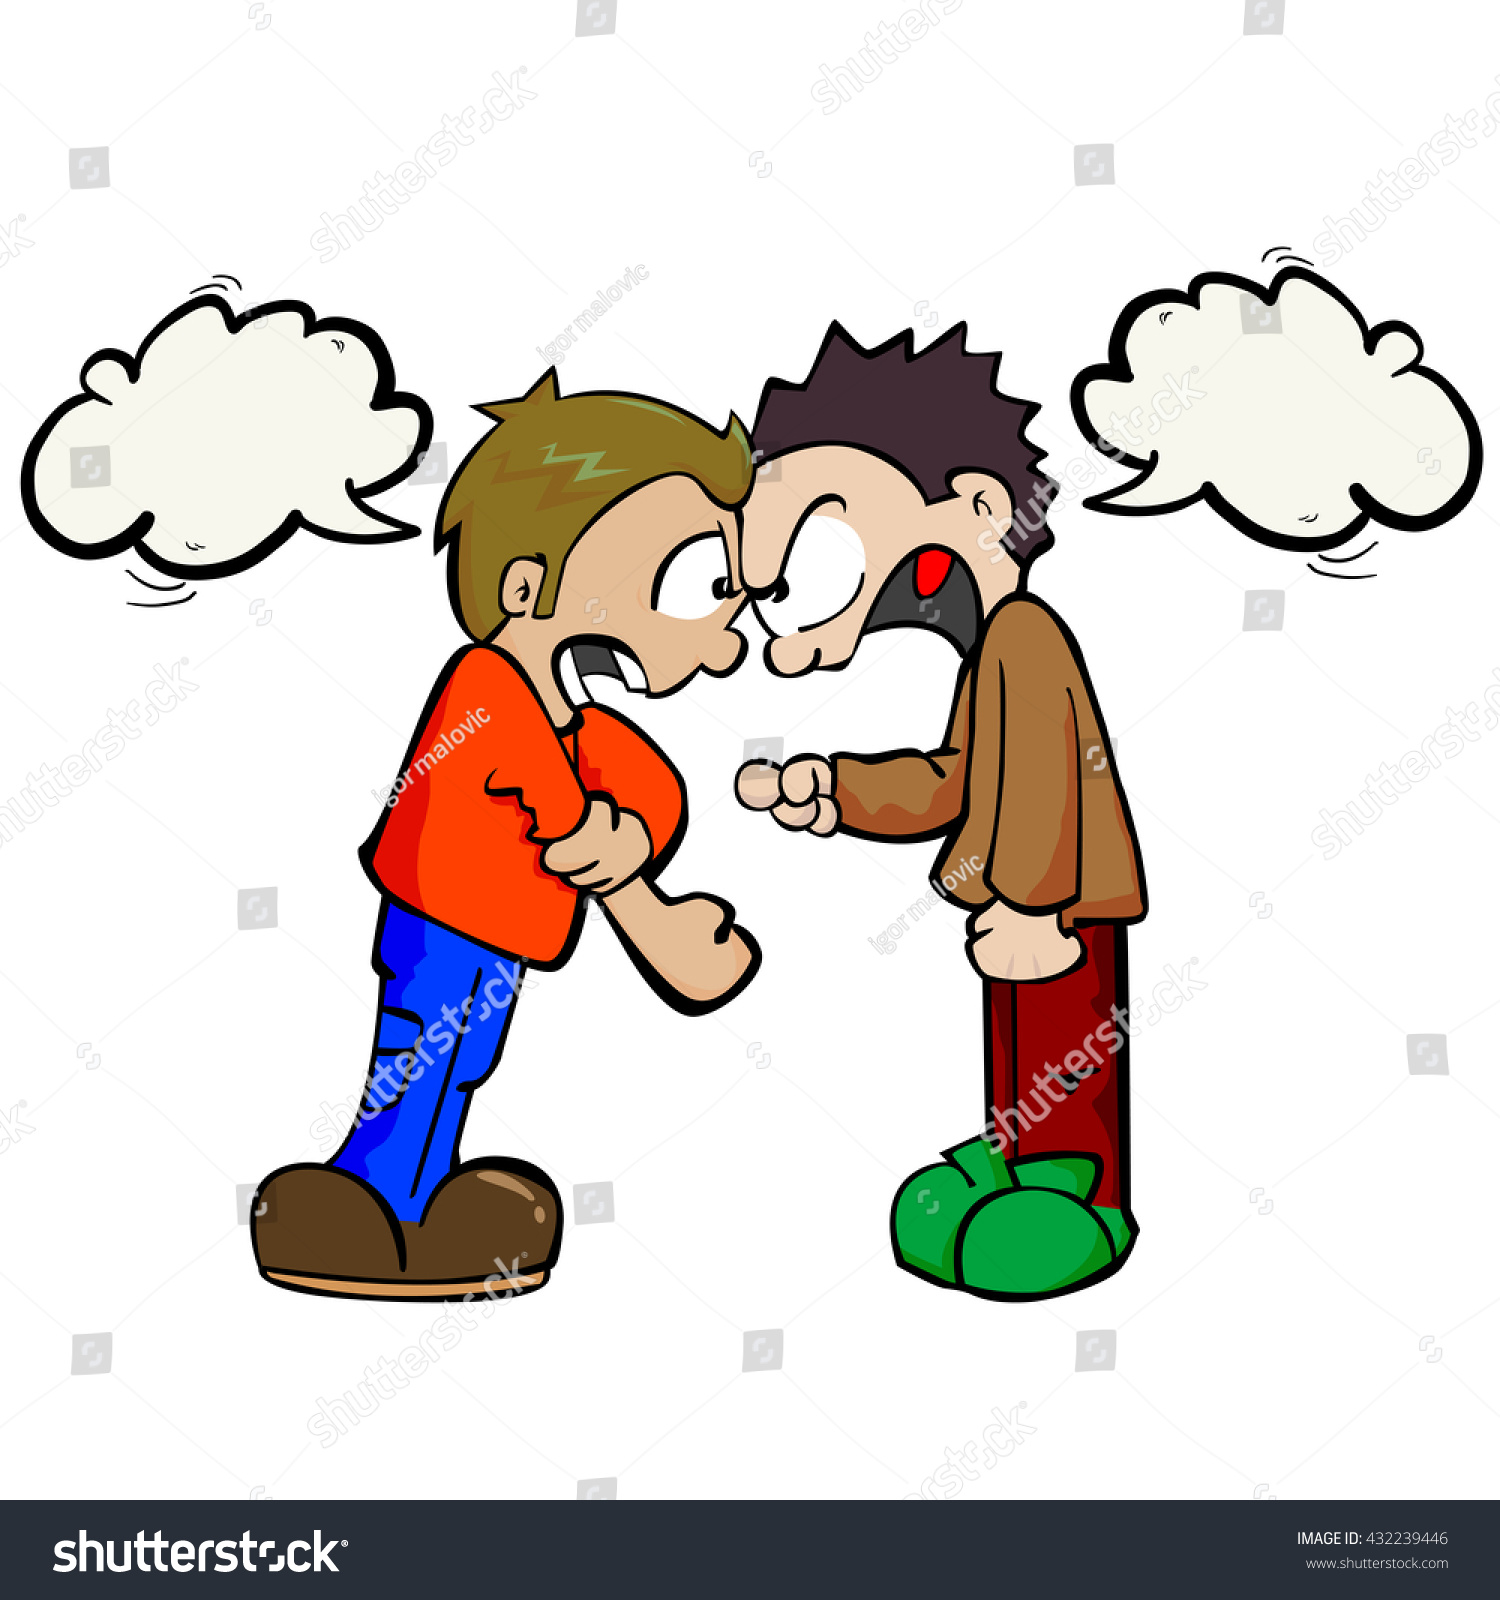 Two Boys Speech Bubbles Fighting Cartoon Stock Vector